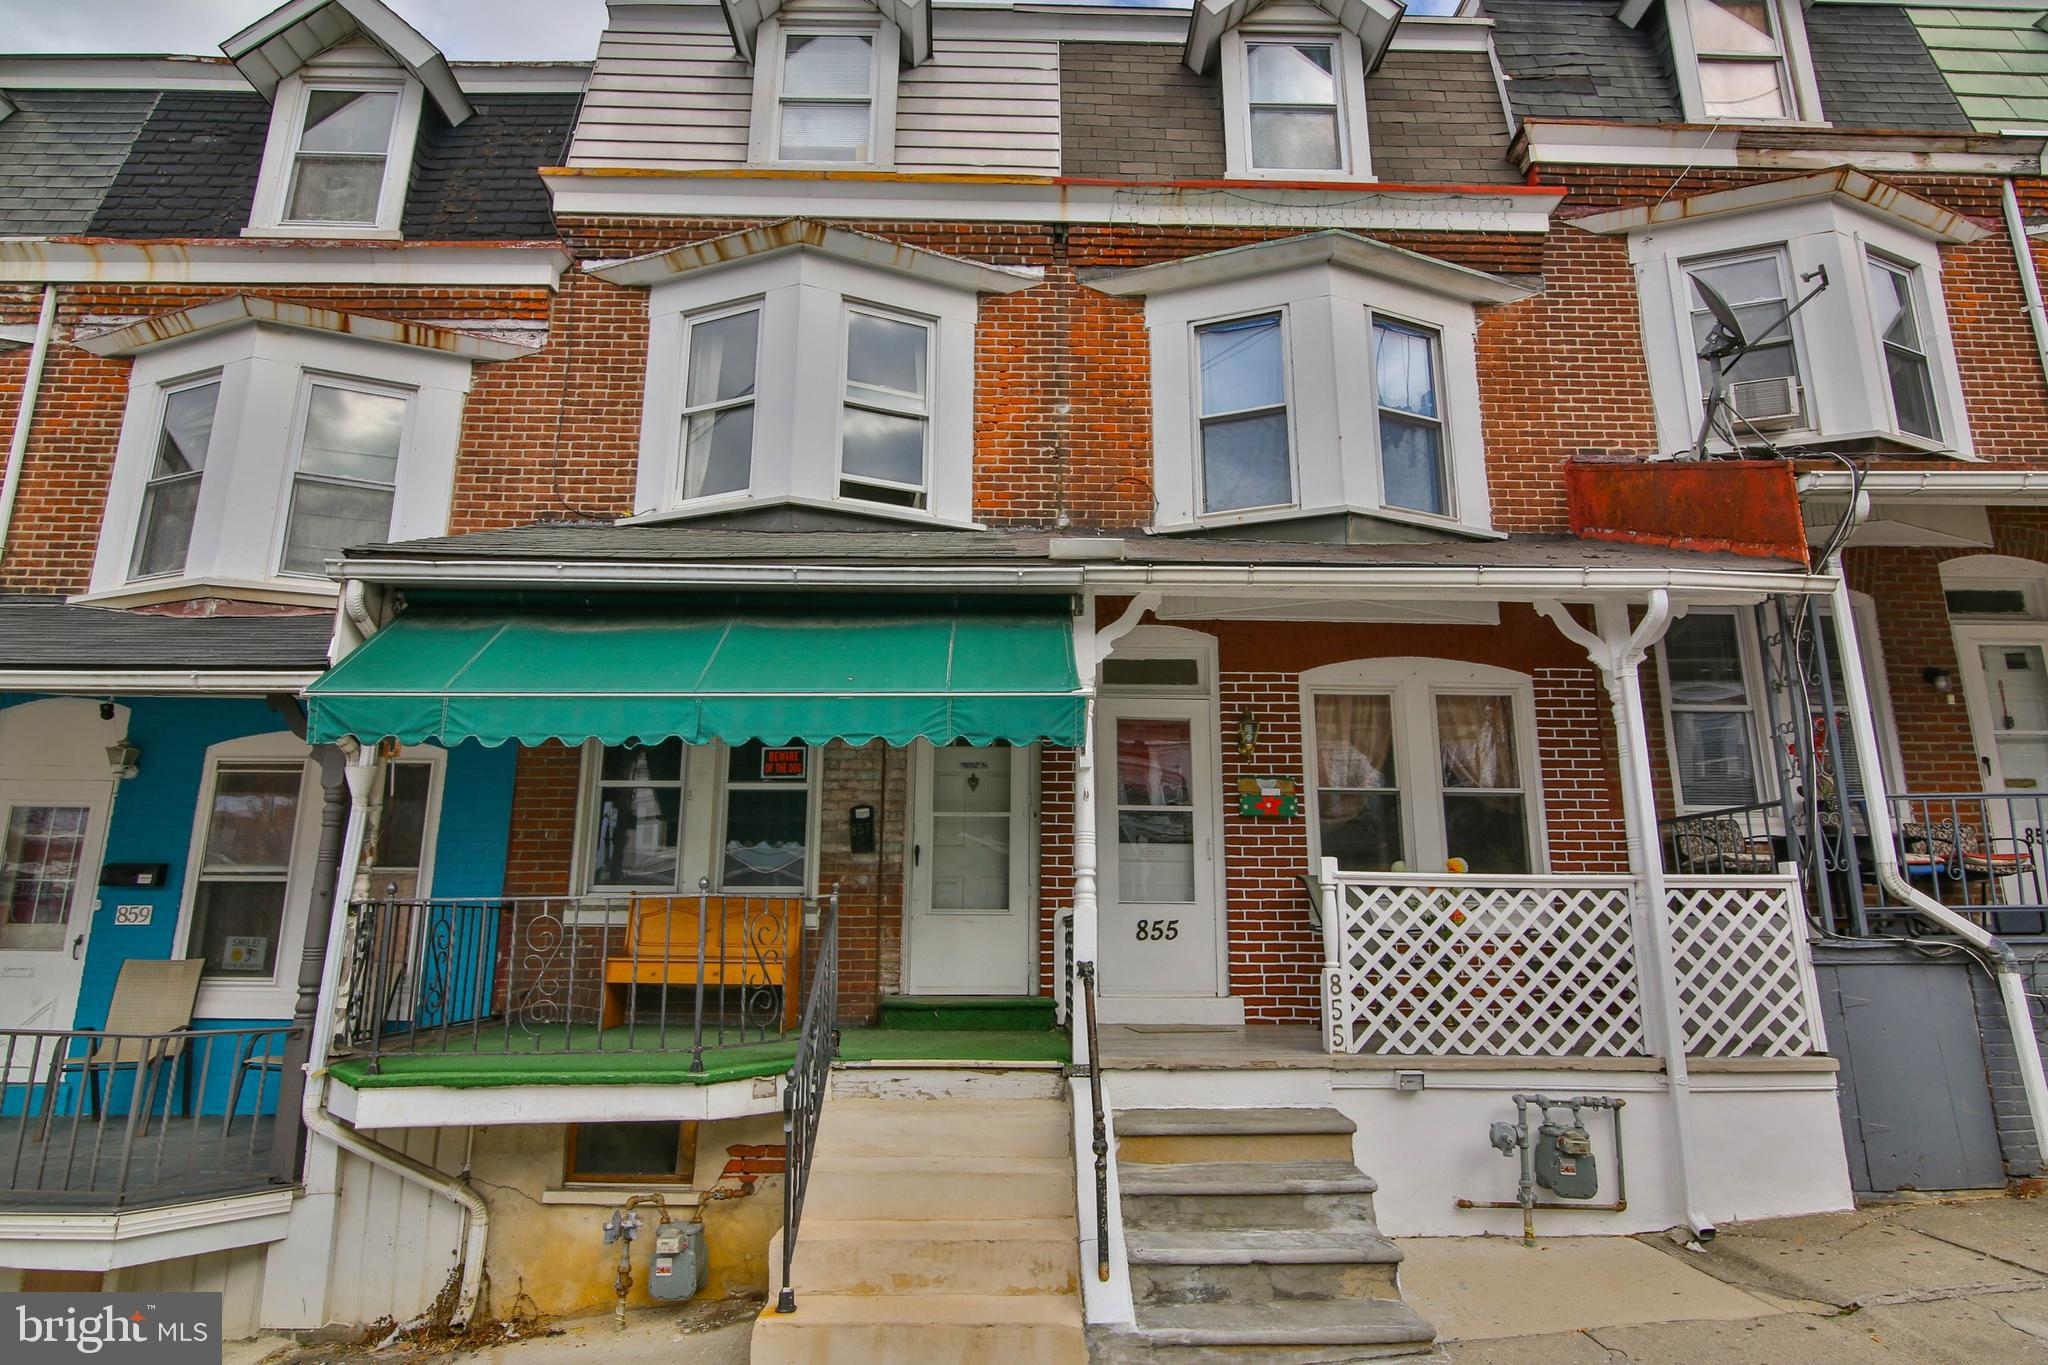 857 N 8TH STREET, ALLENTOWN, PA 18102